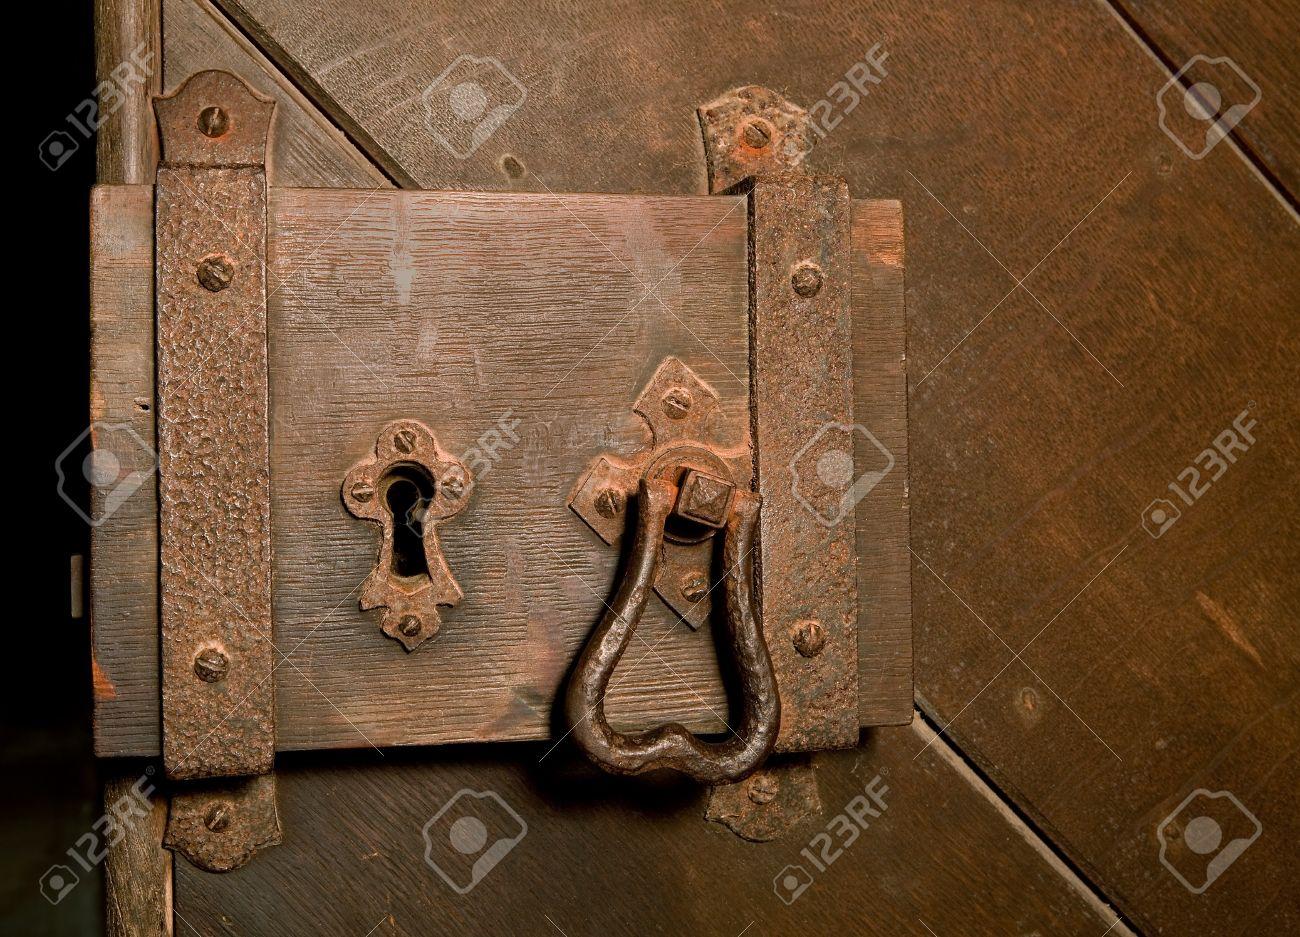 Antique rusty lock on a medieval wooden door Stock Photo - 11072258